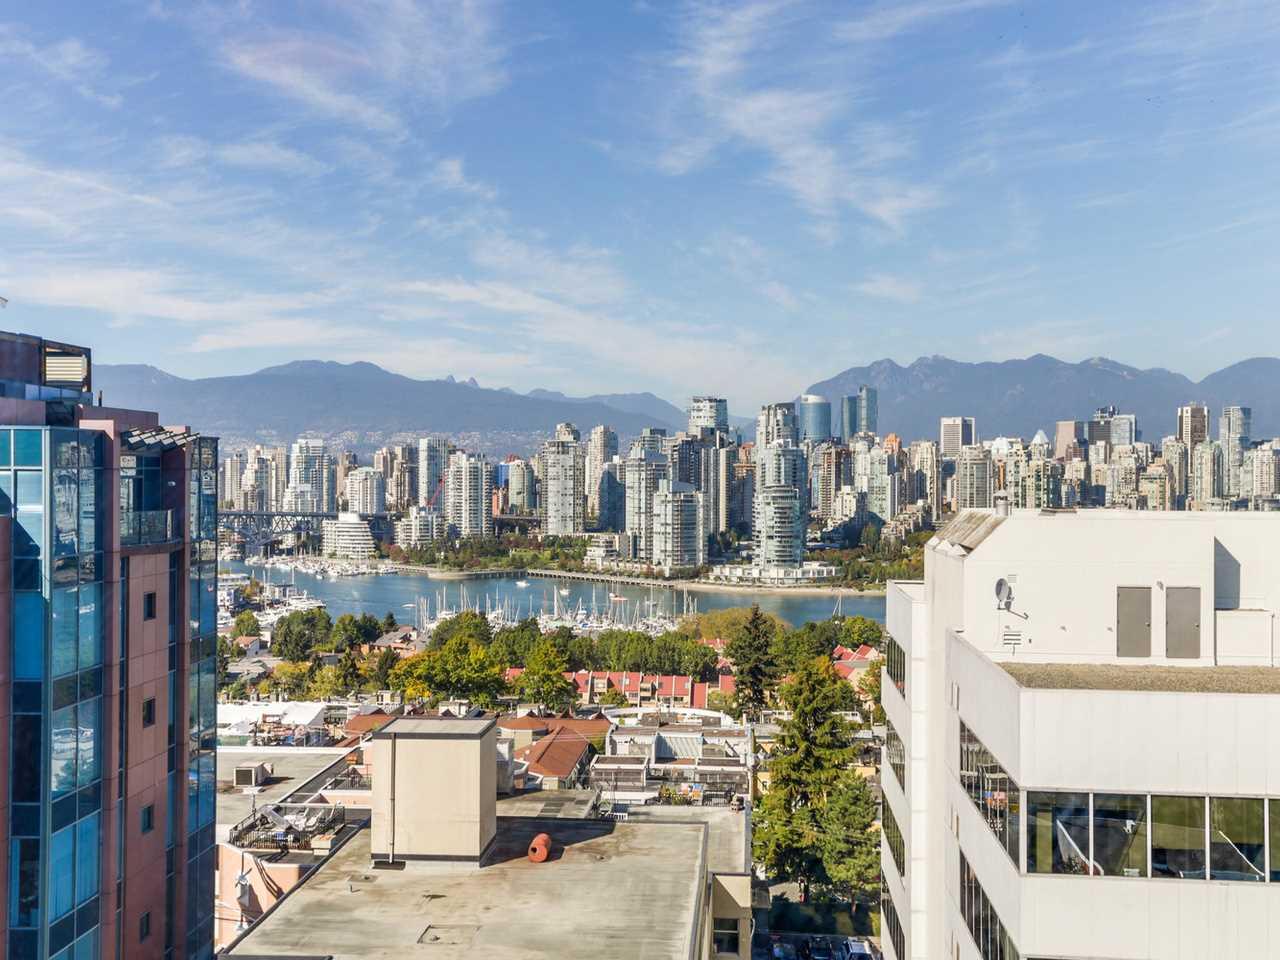 1106 1030 W BROADWAY, Vancouver, BC, V6H 4J5 Primary Photo